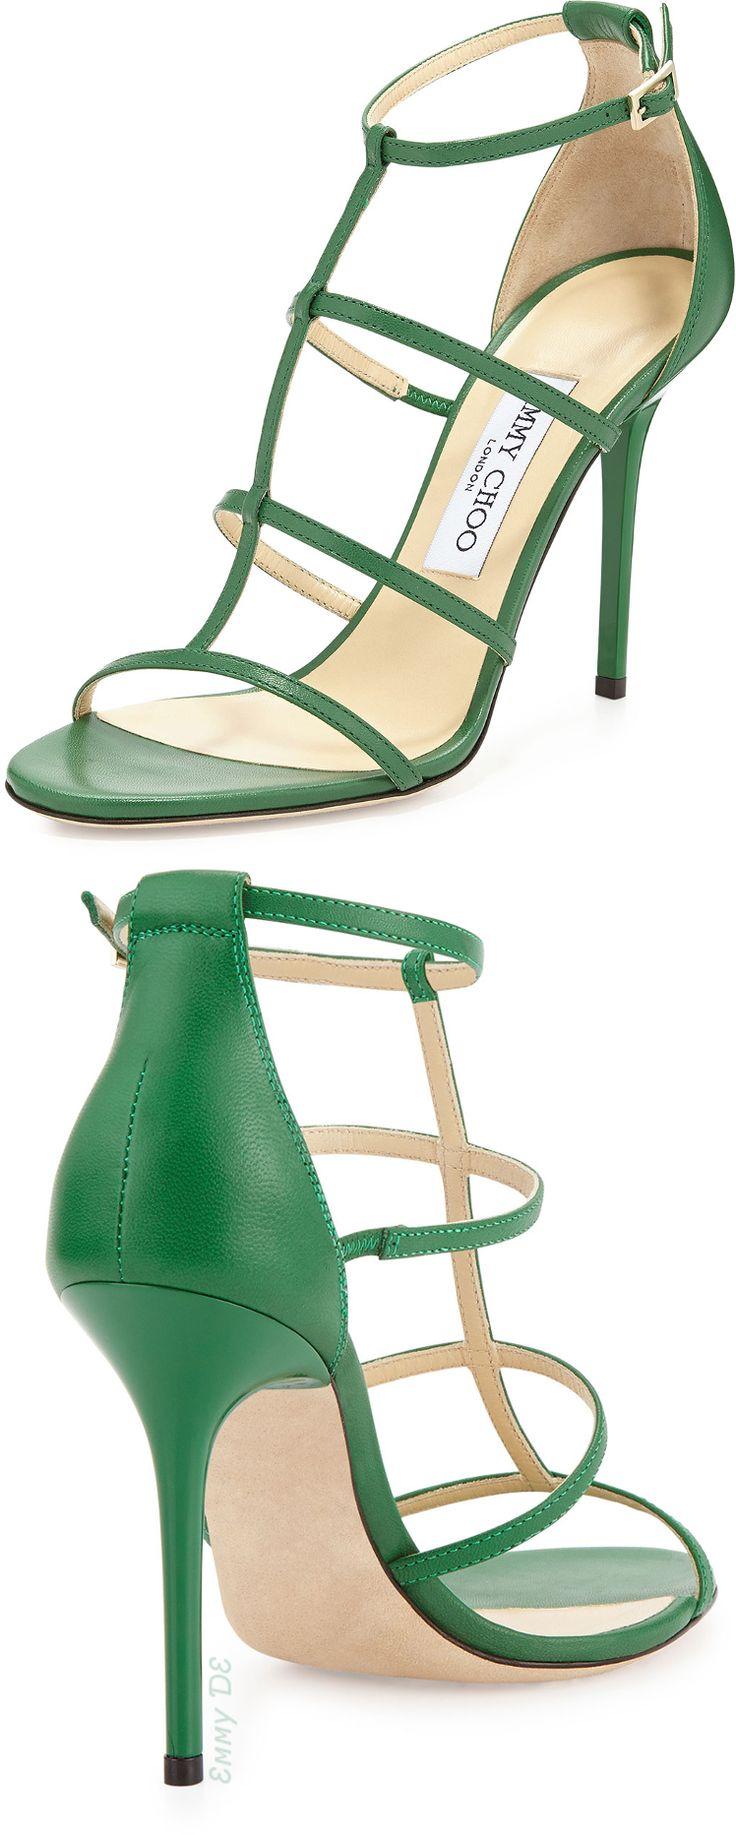 Jimmy Choo ~ Emerald Green T-Strap Sandals